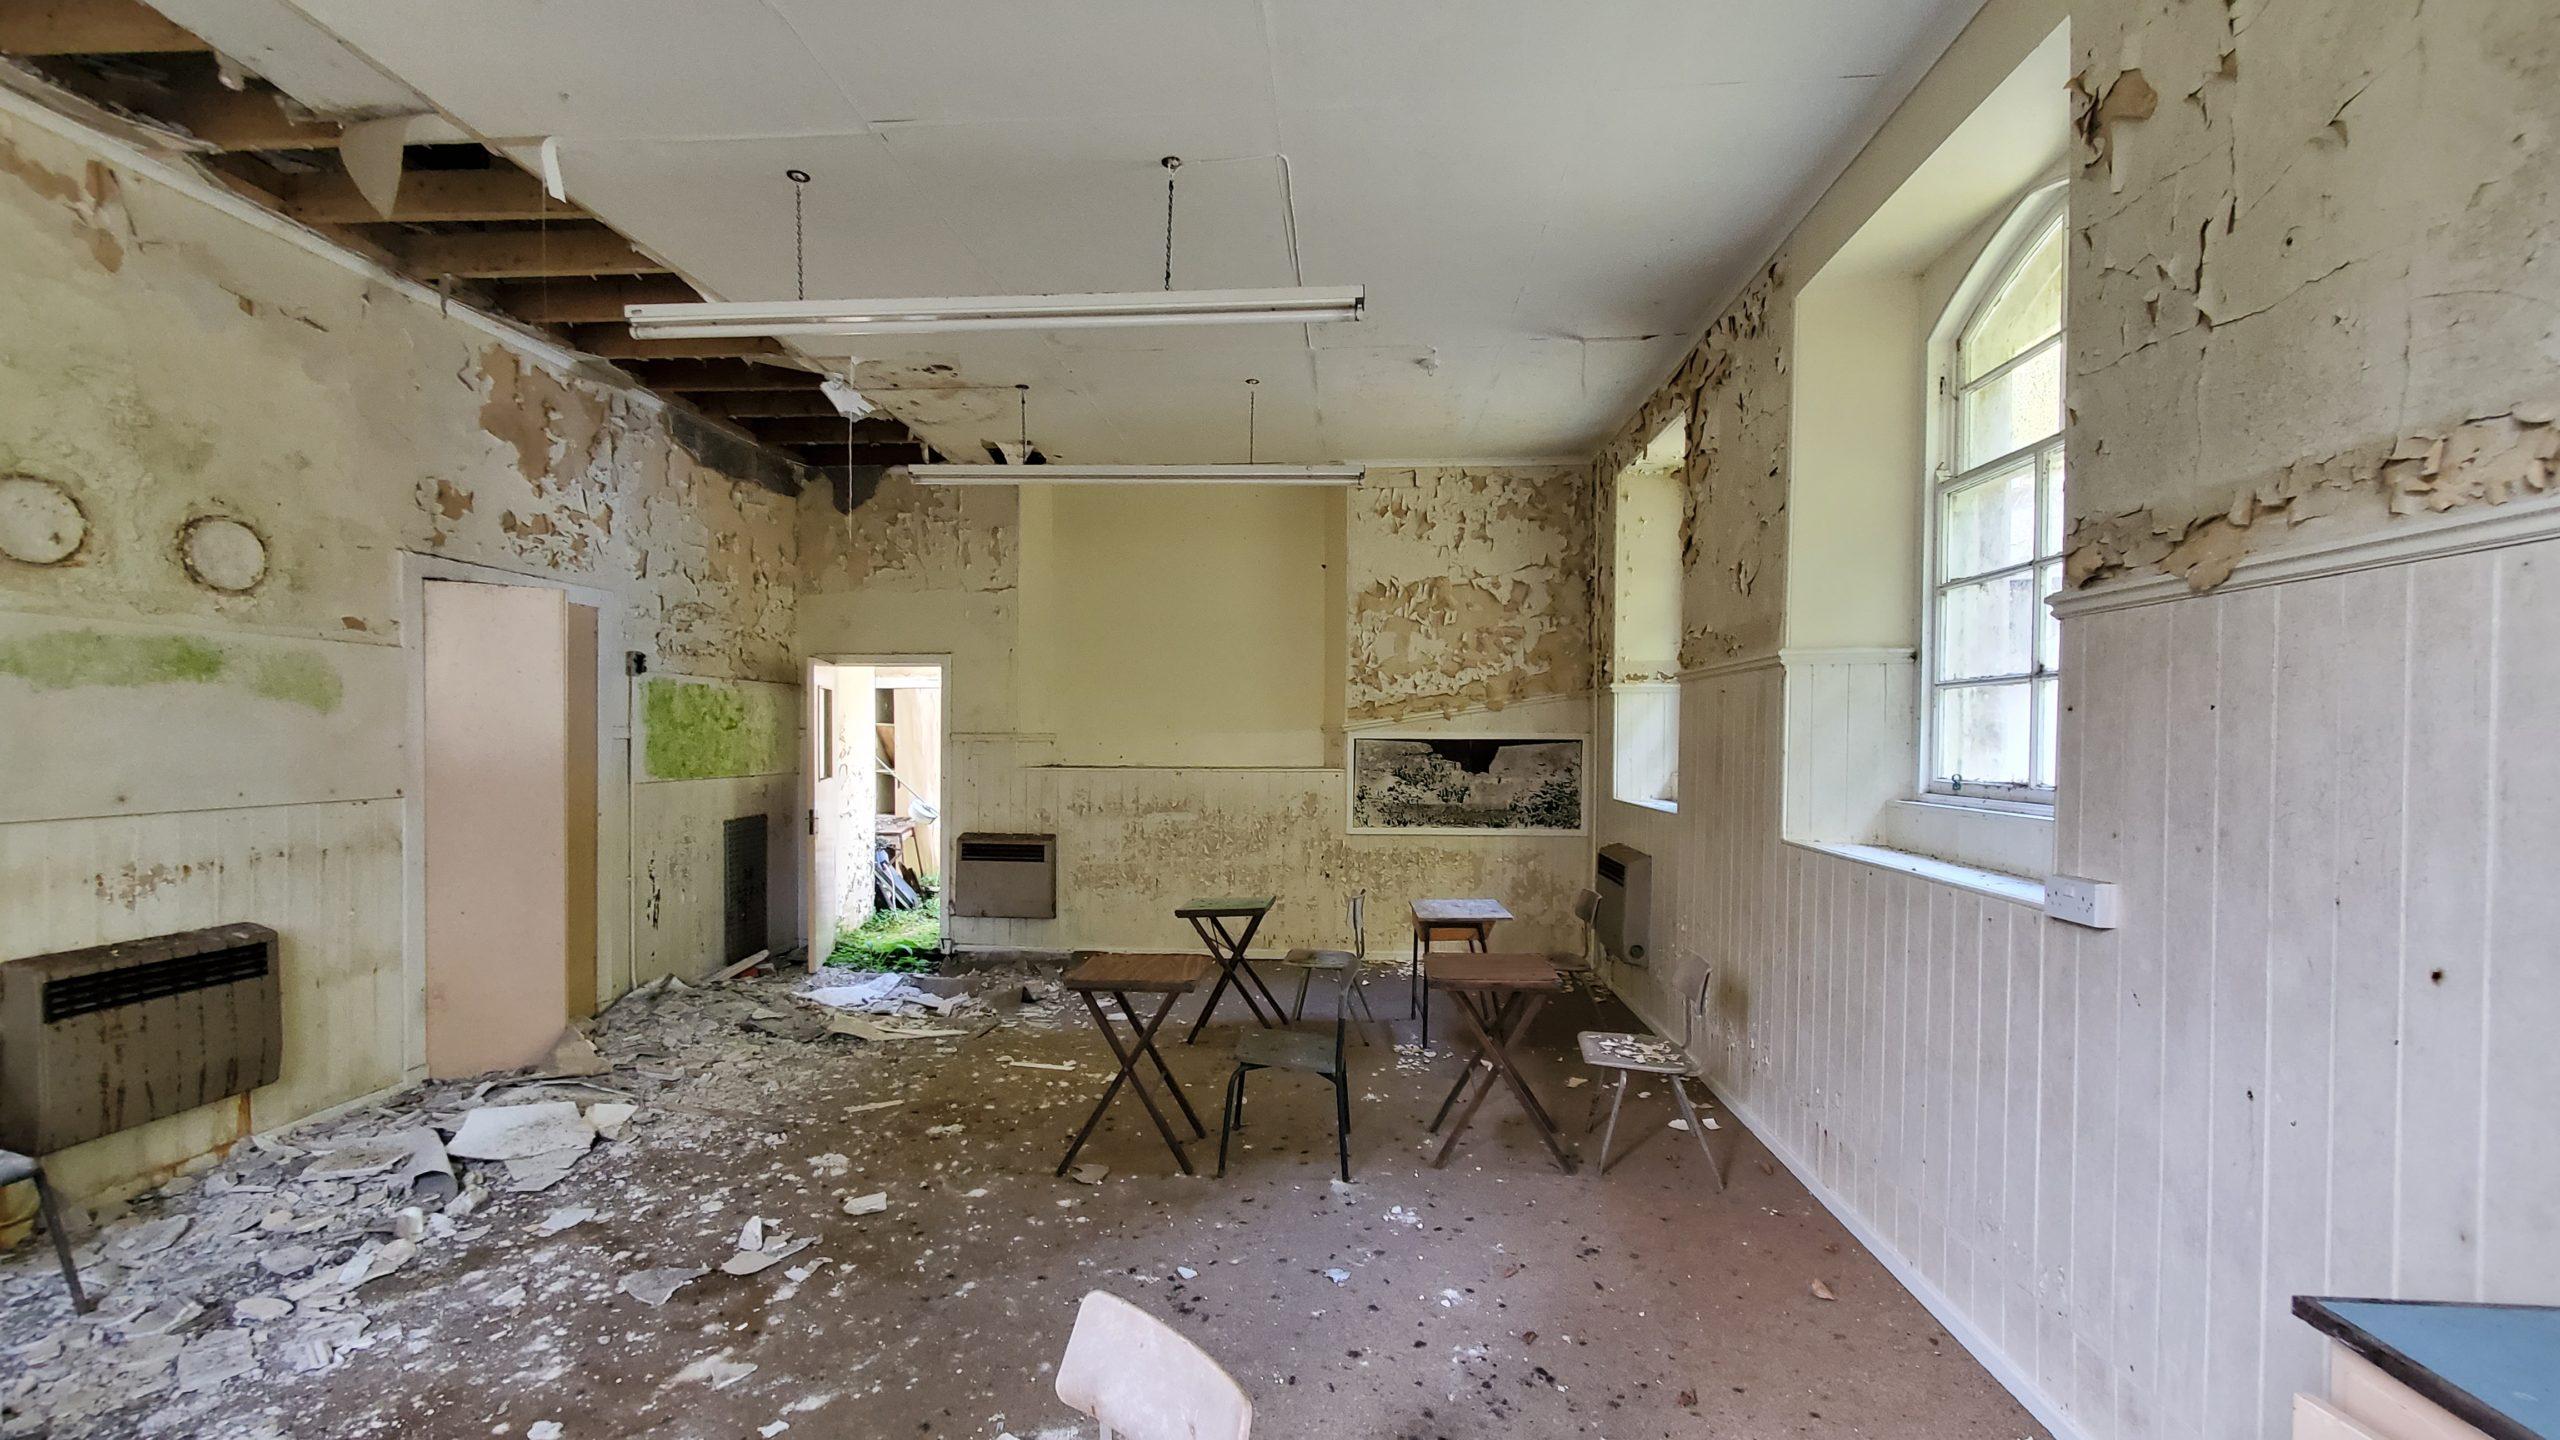 desks in an abandoned building